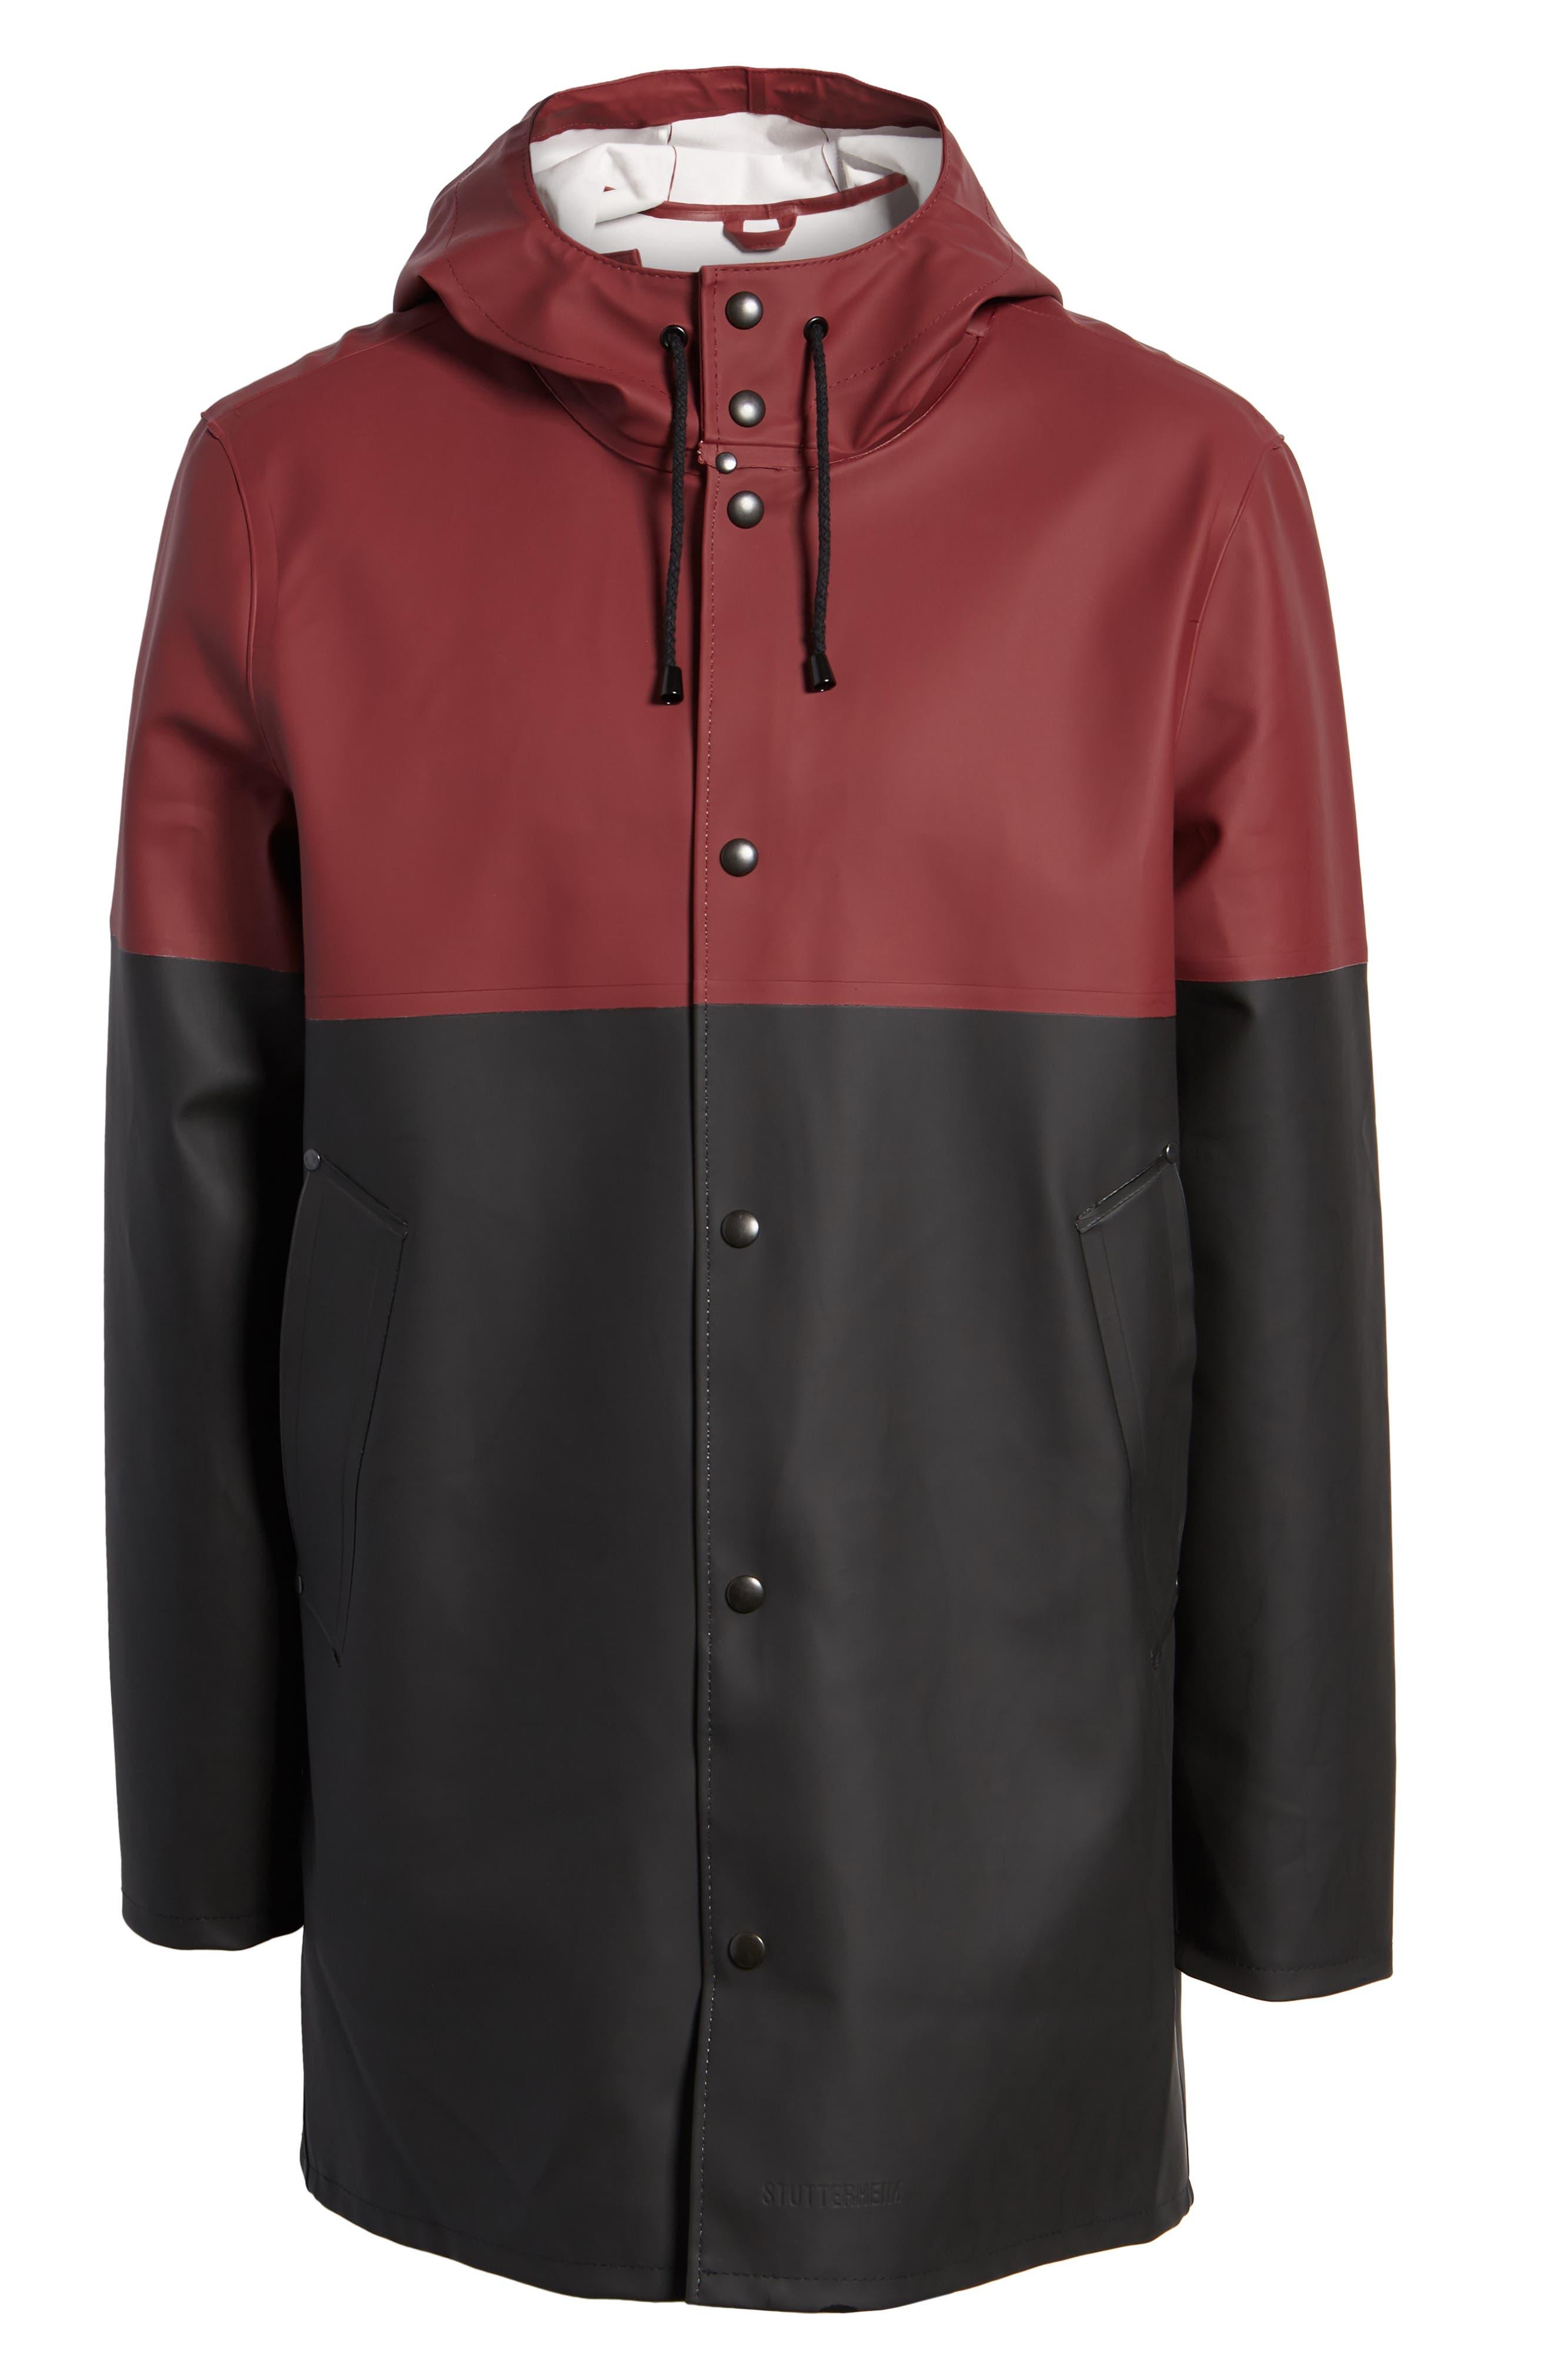 Stockholm Colorblock Waterproof Hooded Raincoat,                             Alternate thumbnail 6, color,                             BURGUNDY/ BLACK